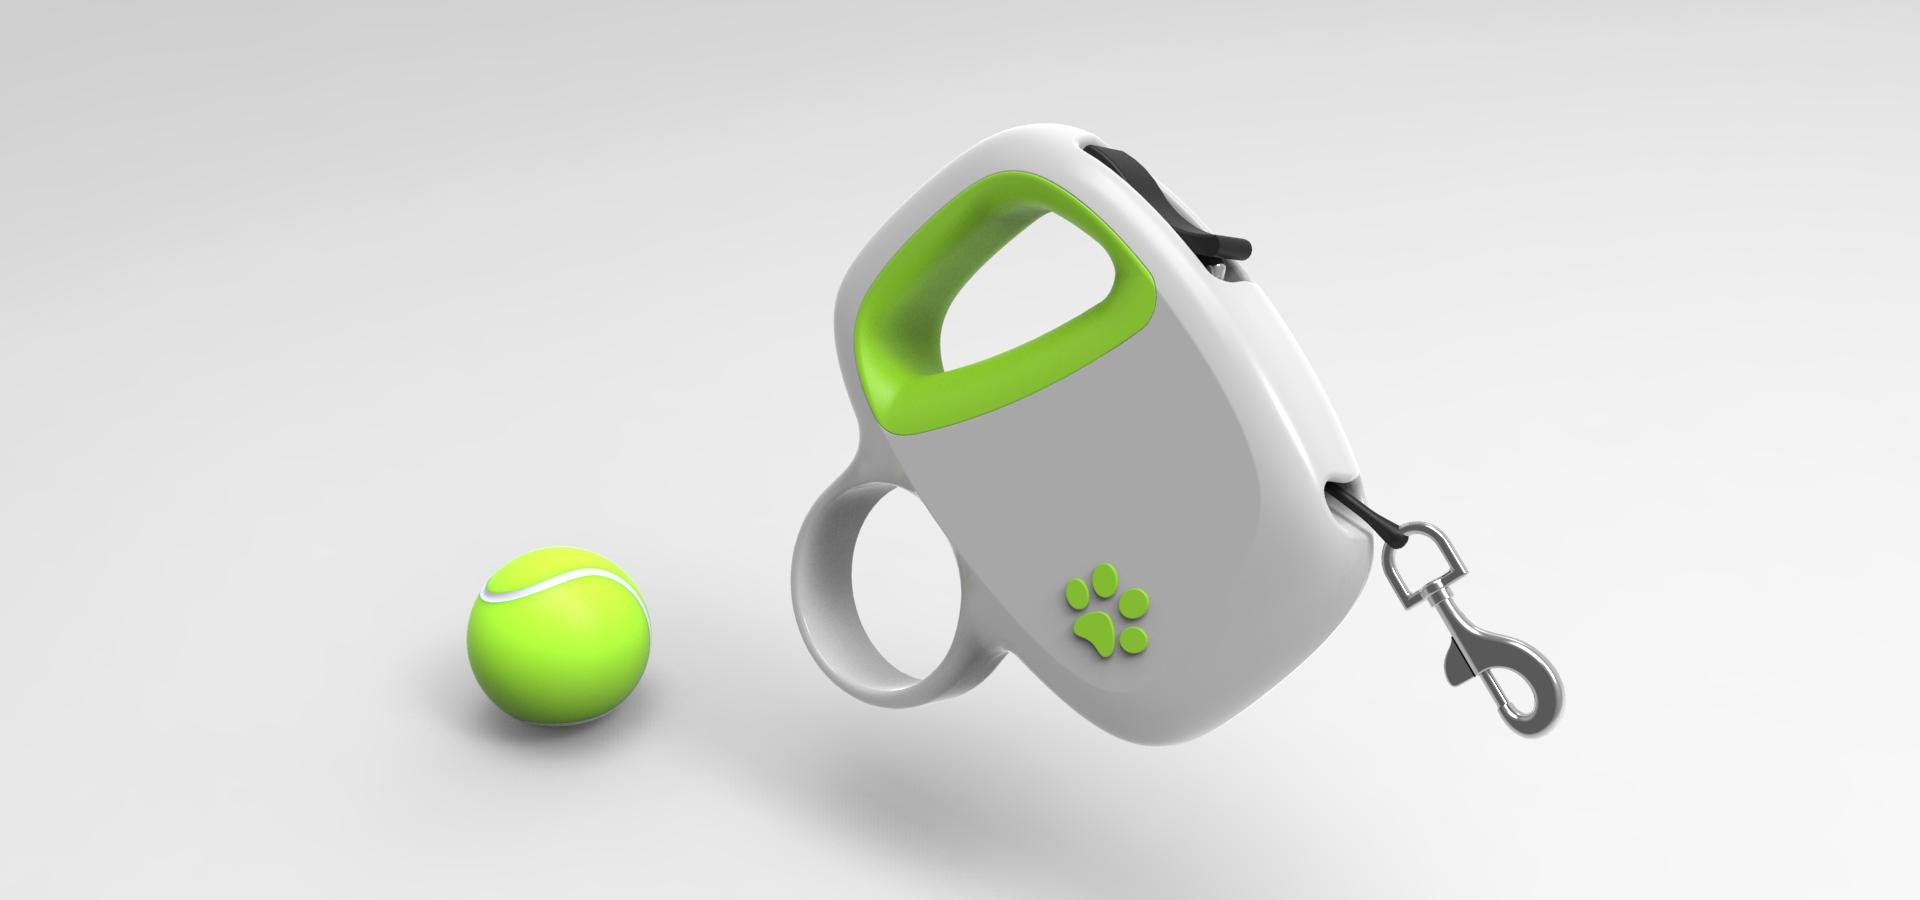 tennisBall-Leash.5.jpg